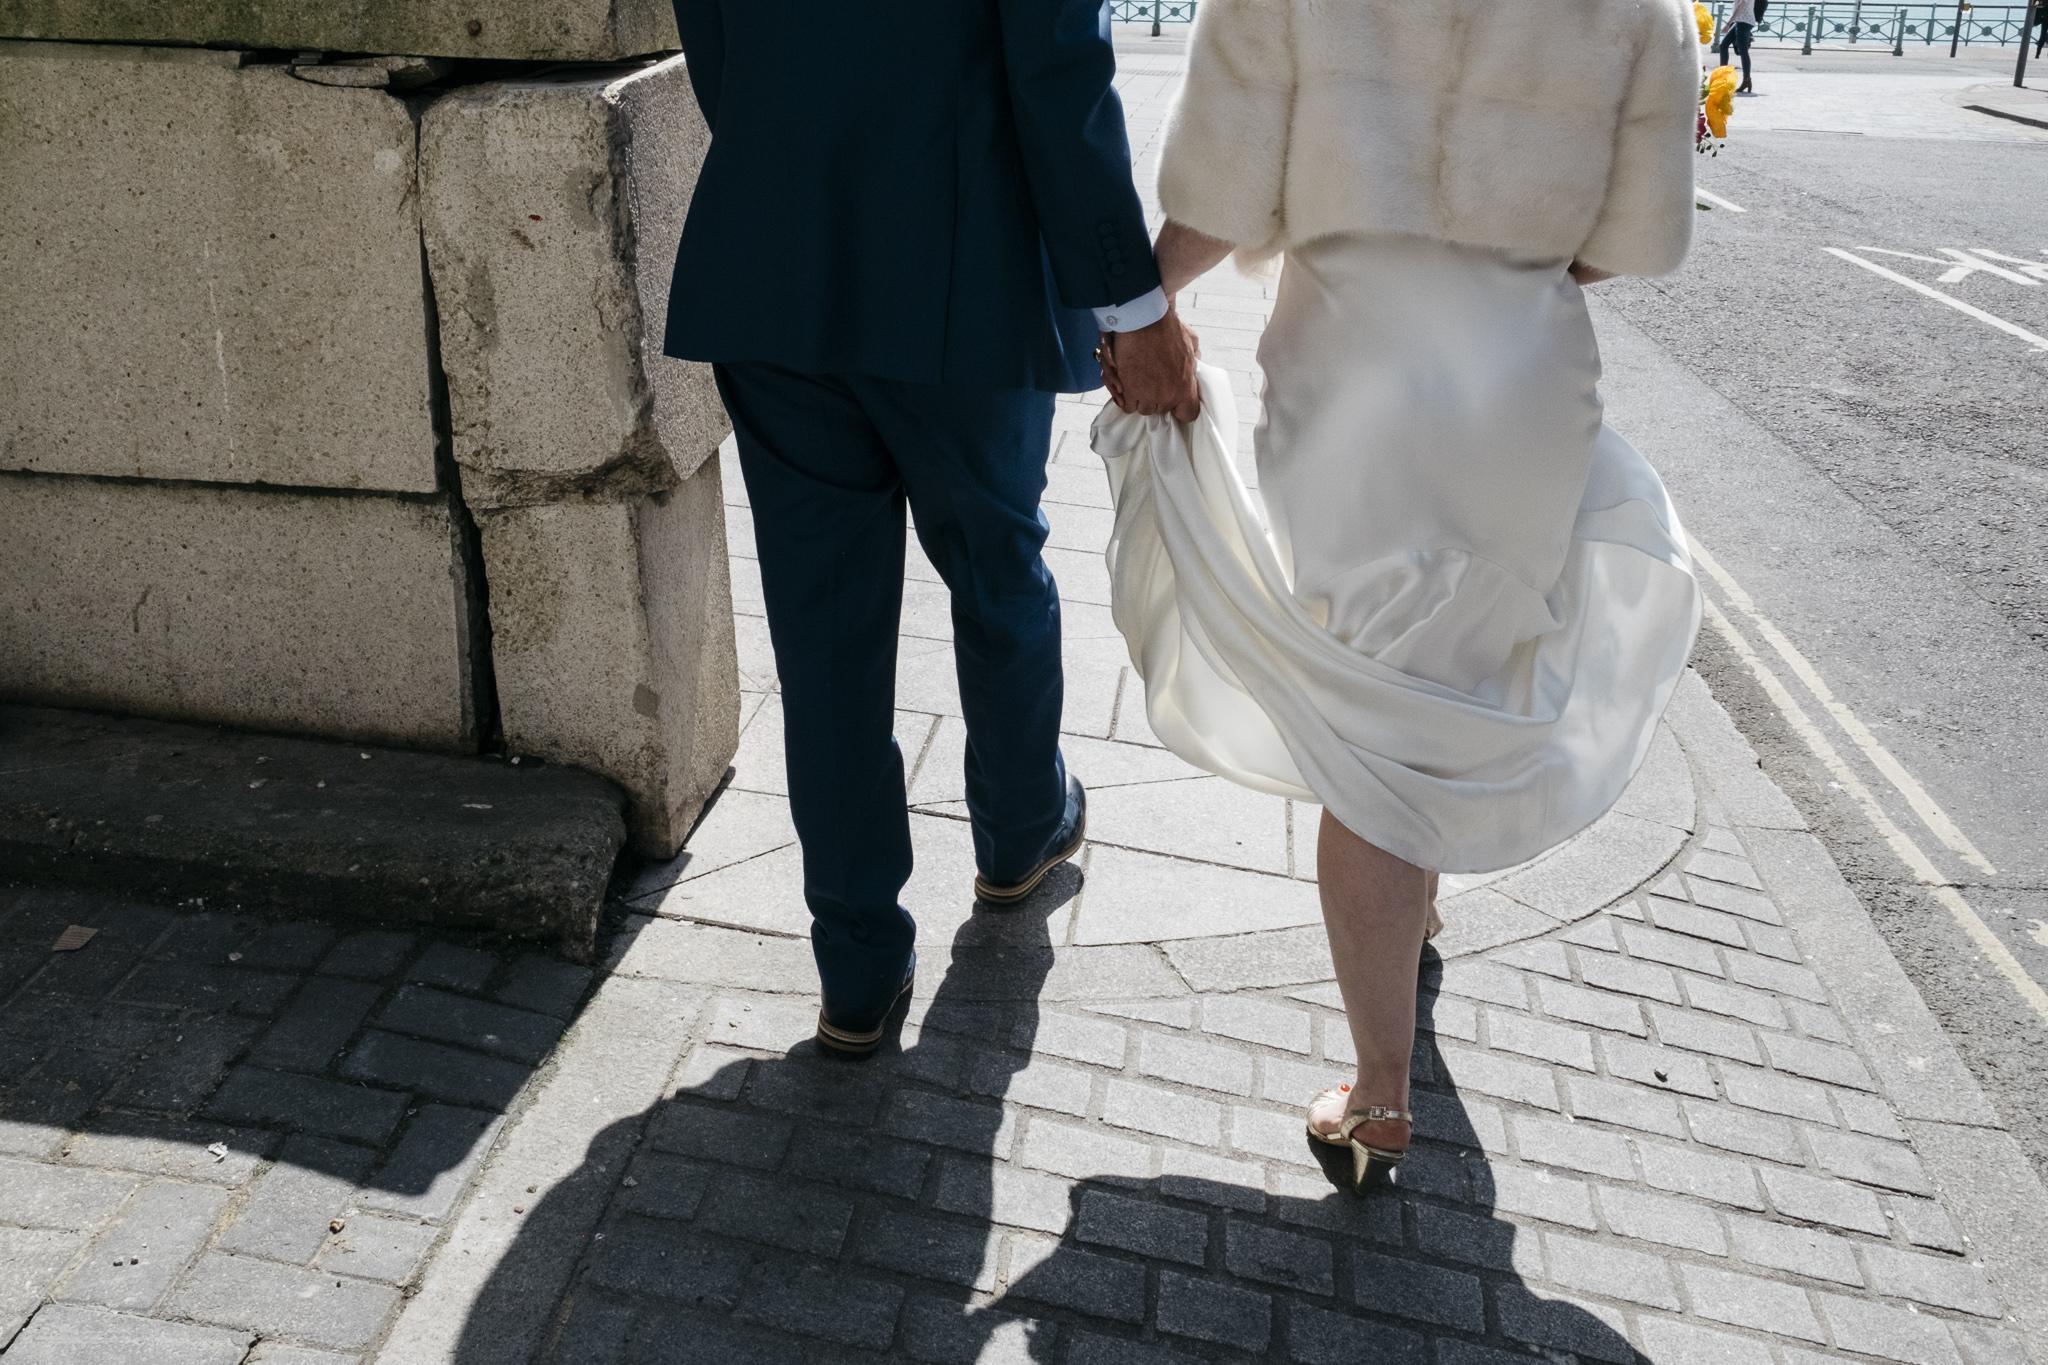 short_coverage_wedding_photographer_brighton_020.jpg